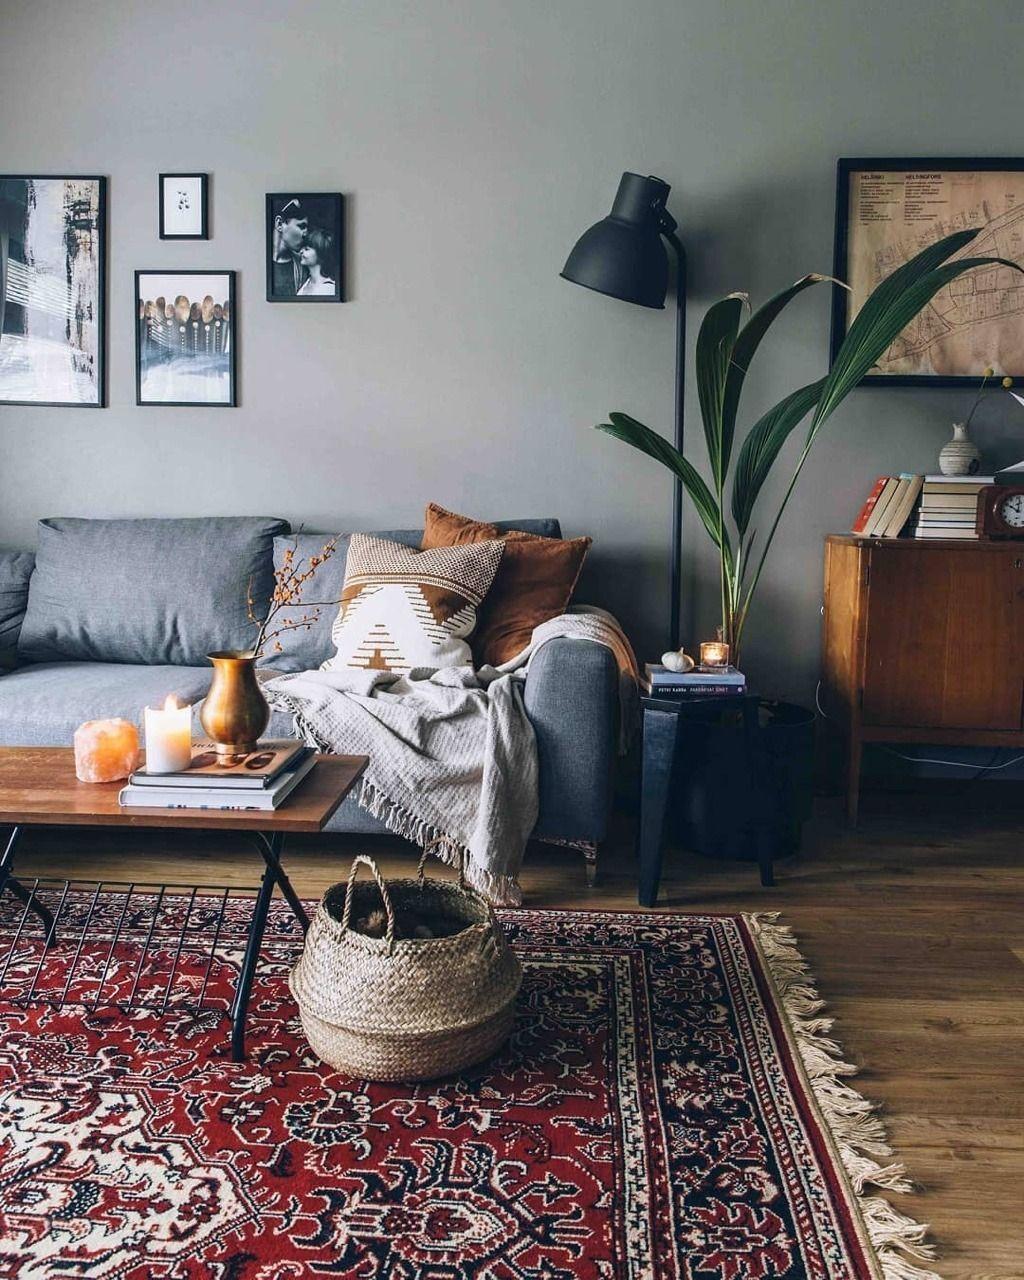 French Bathroom Decor Excellent Magnolia Home Furn 2020